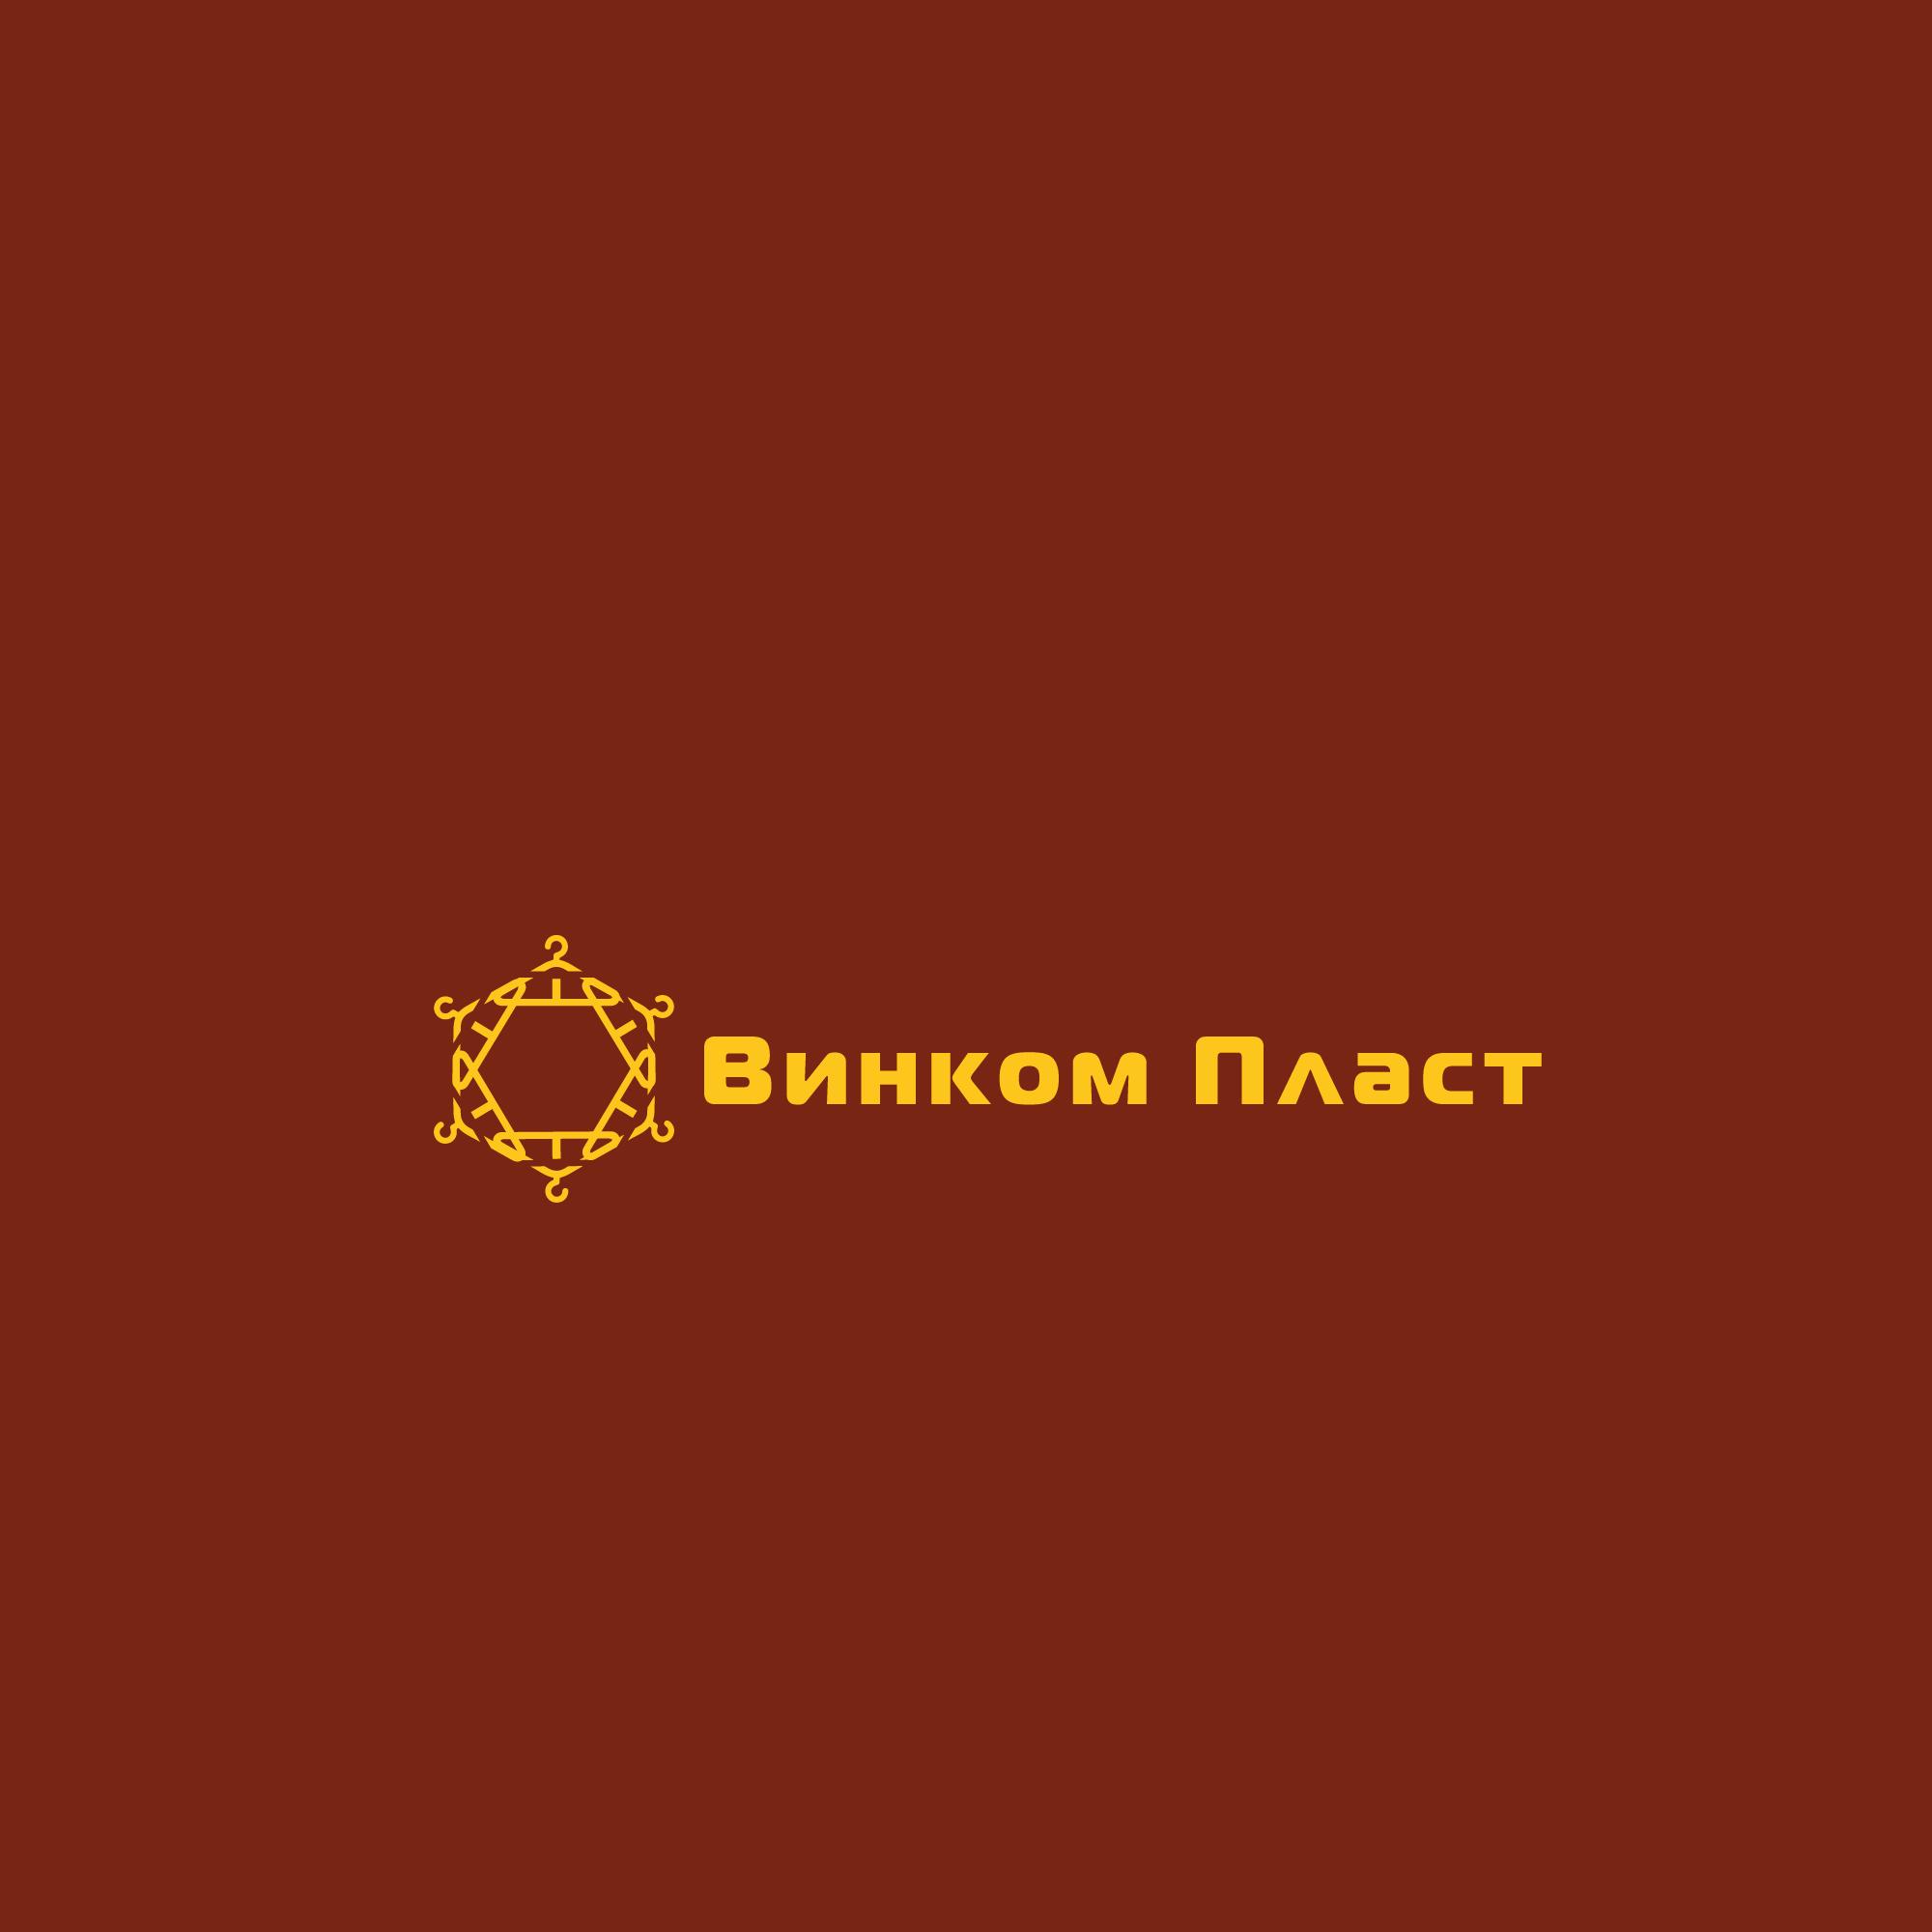 Логотип, фавикон и визитка для компании Винком Пласт  фото f_0515c3d785971ac9.jpg